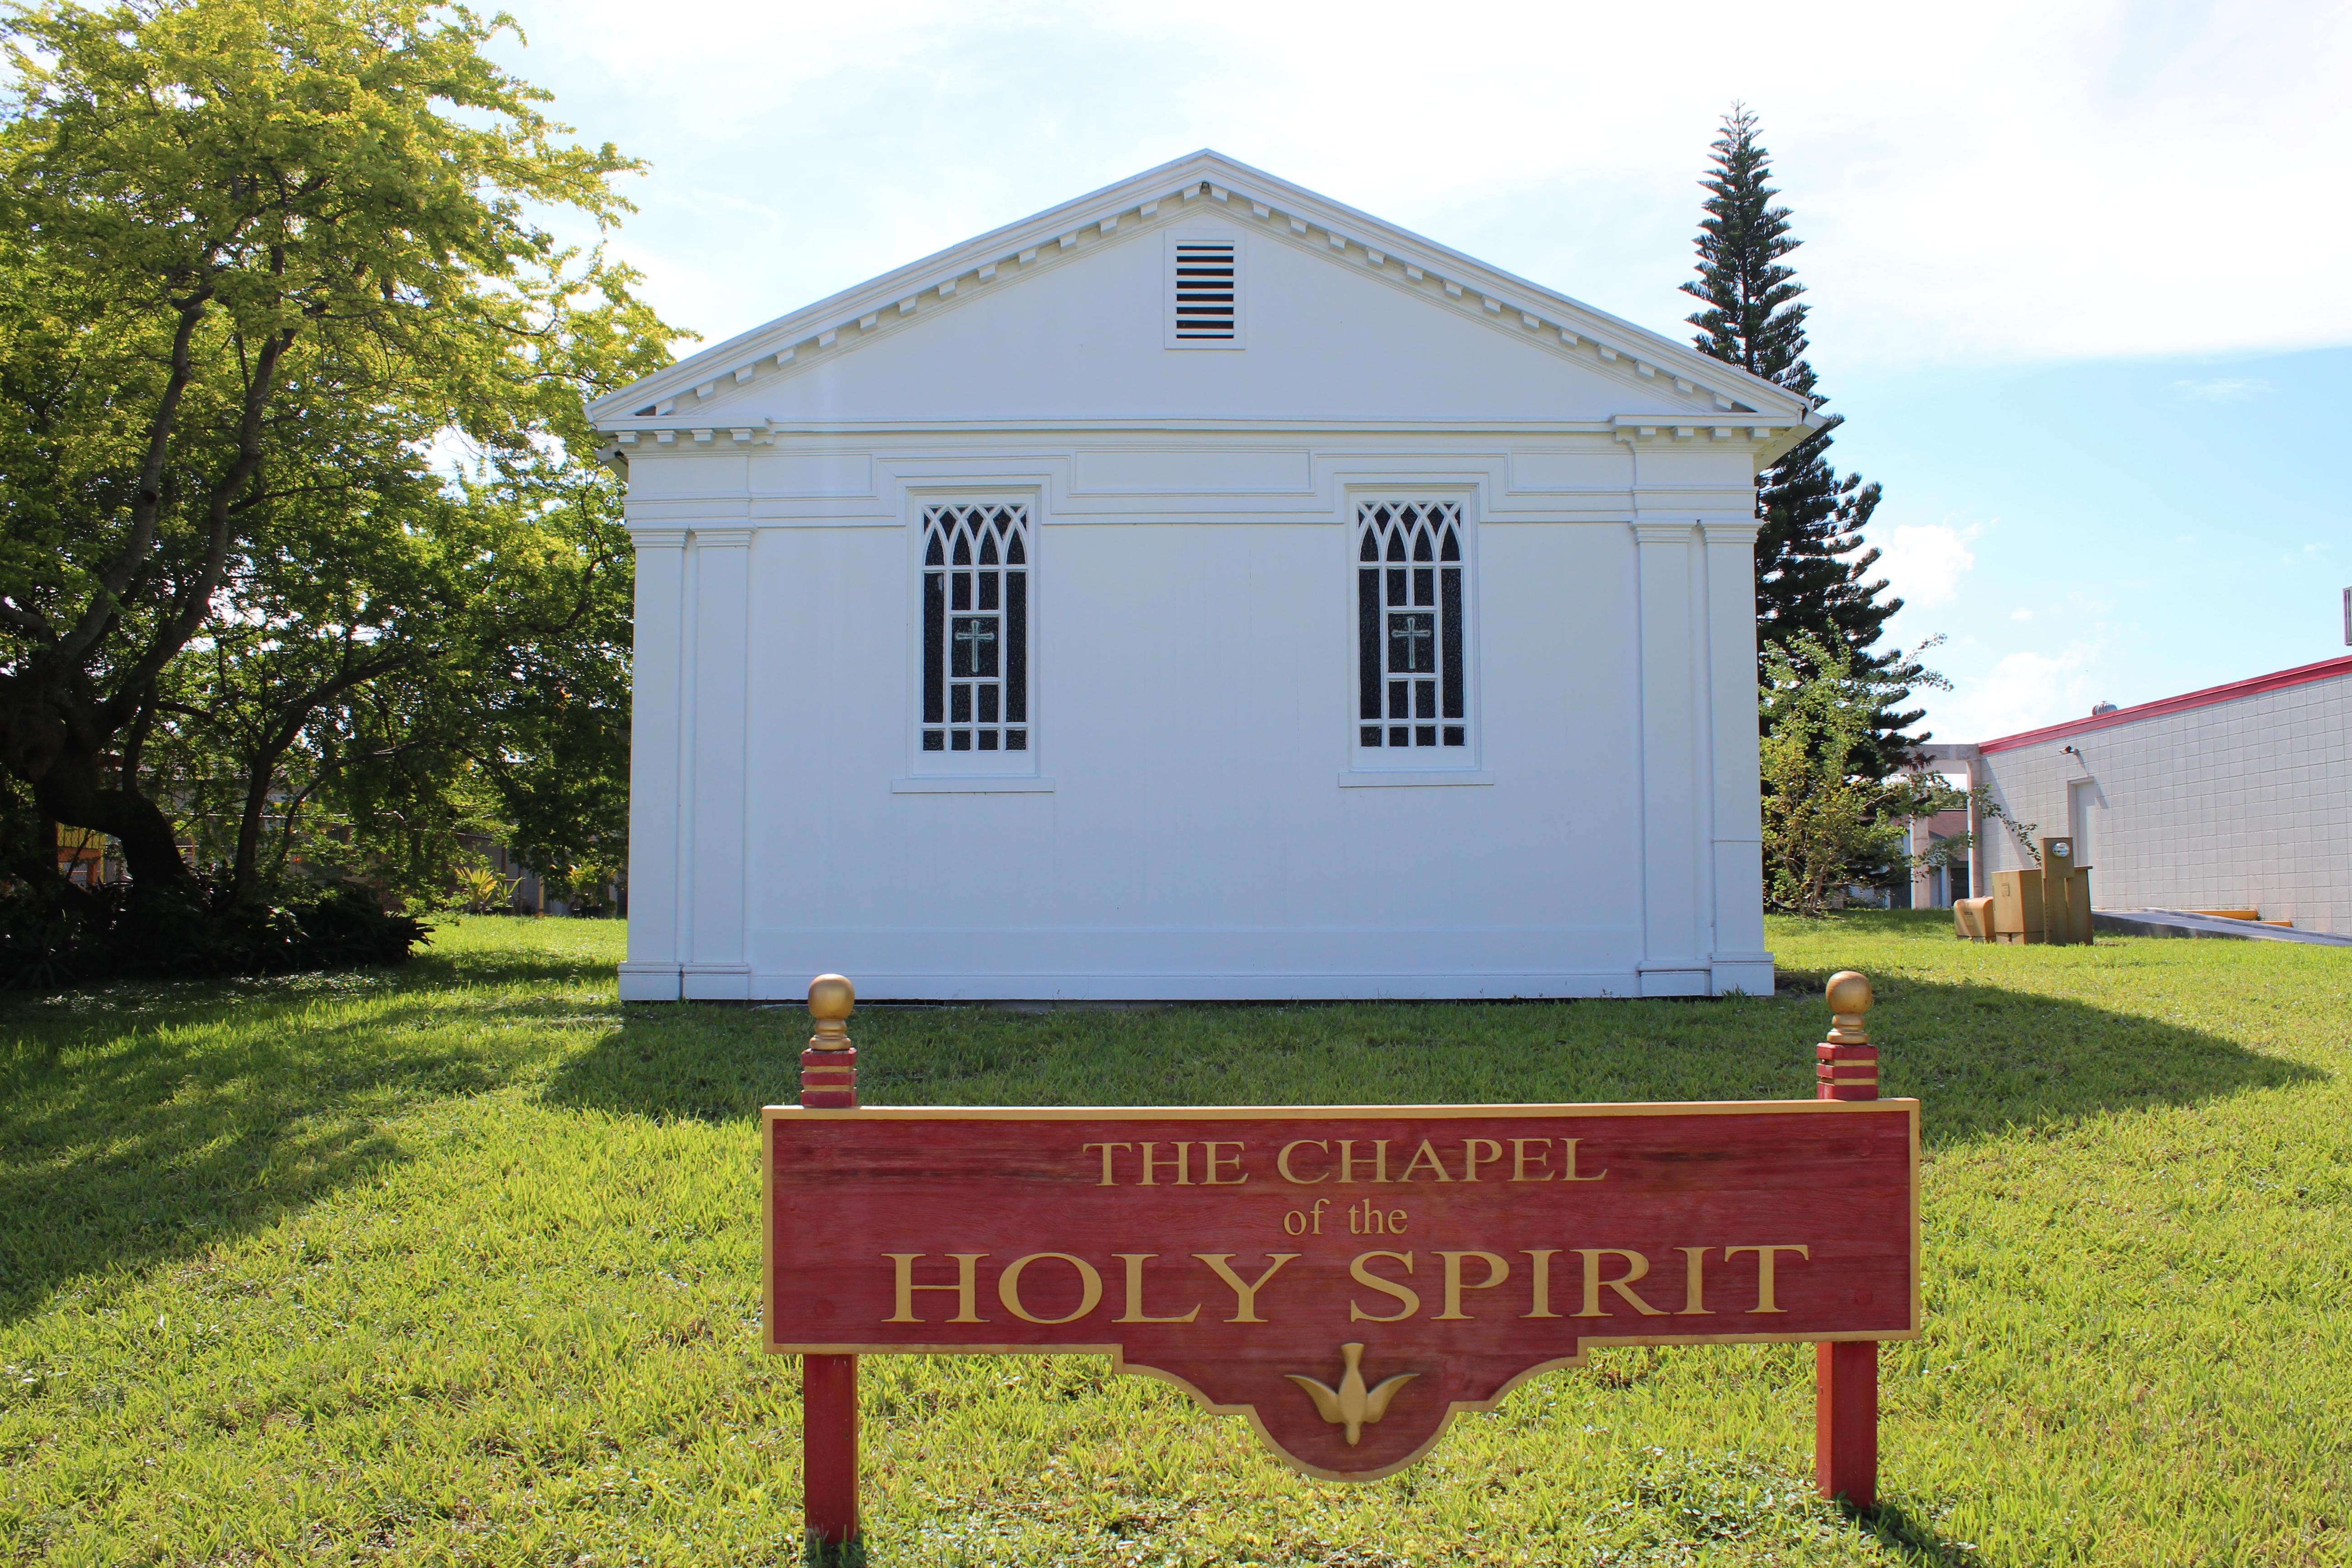 The Chapel of the Holy Spirit -Holy Guardian Angels, Lantana Florida